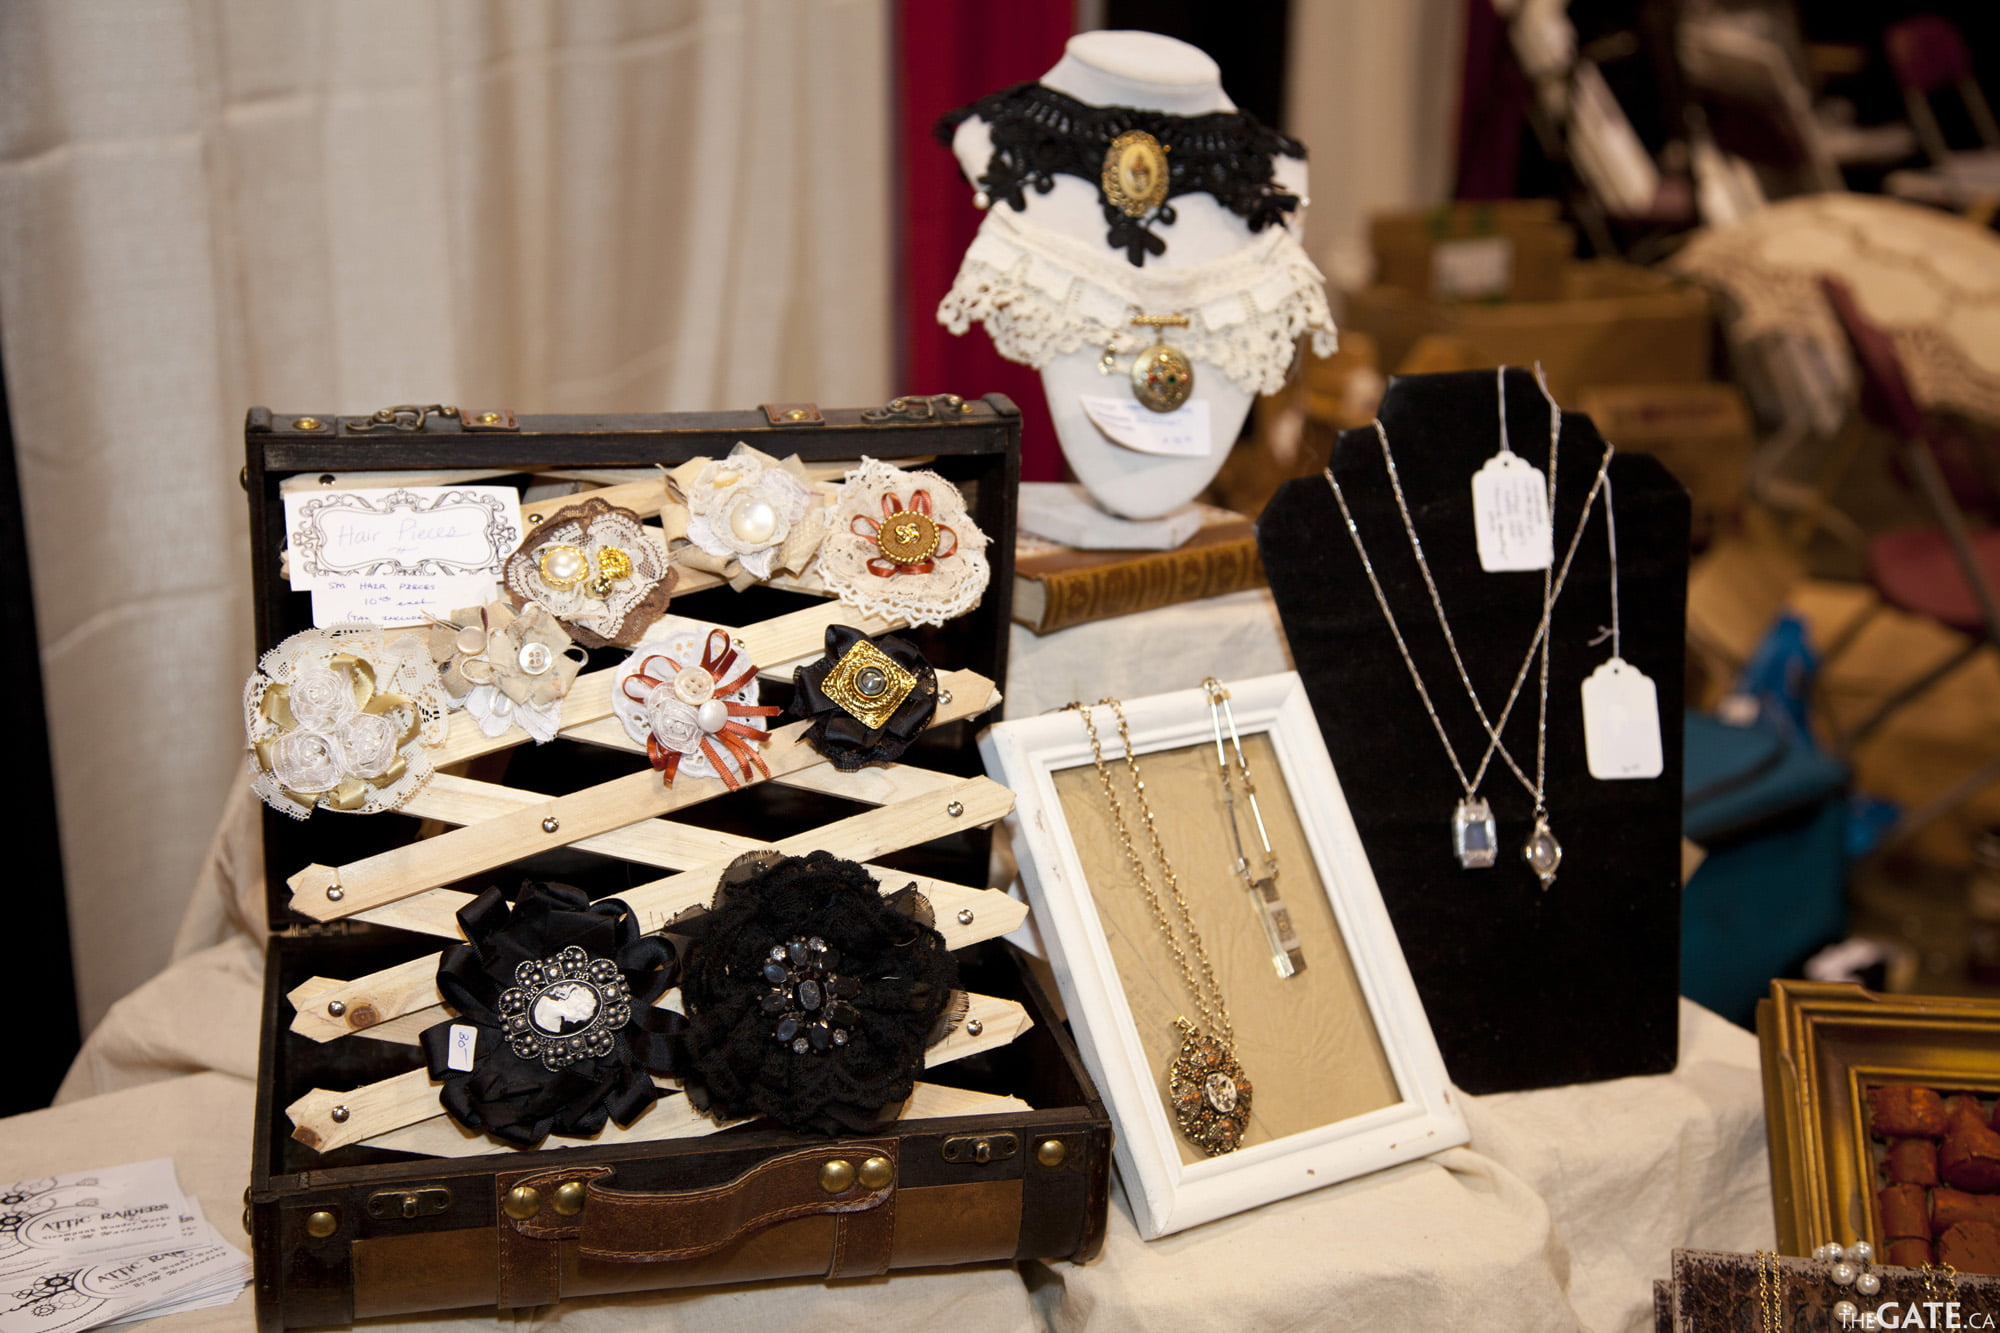 Attic Raiders accessories